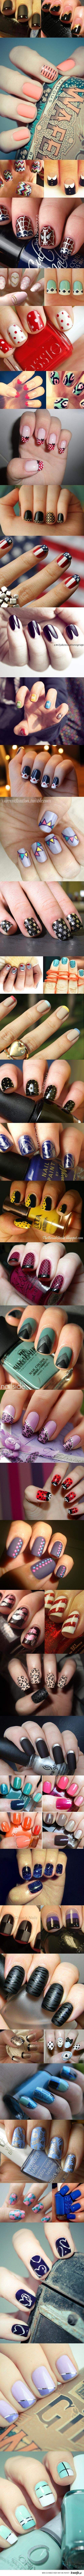 best you like crystal gel images on pinterest nail scissors